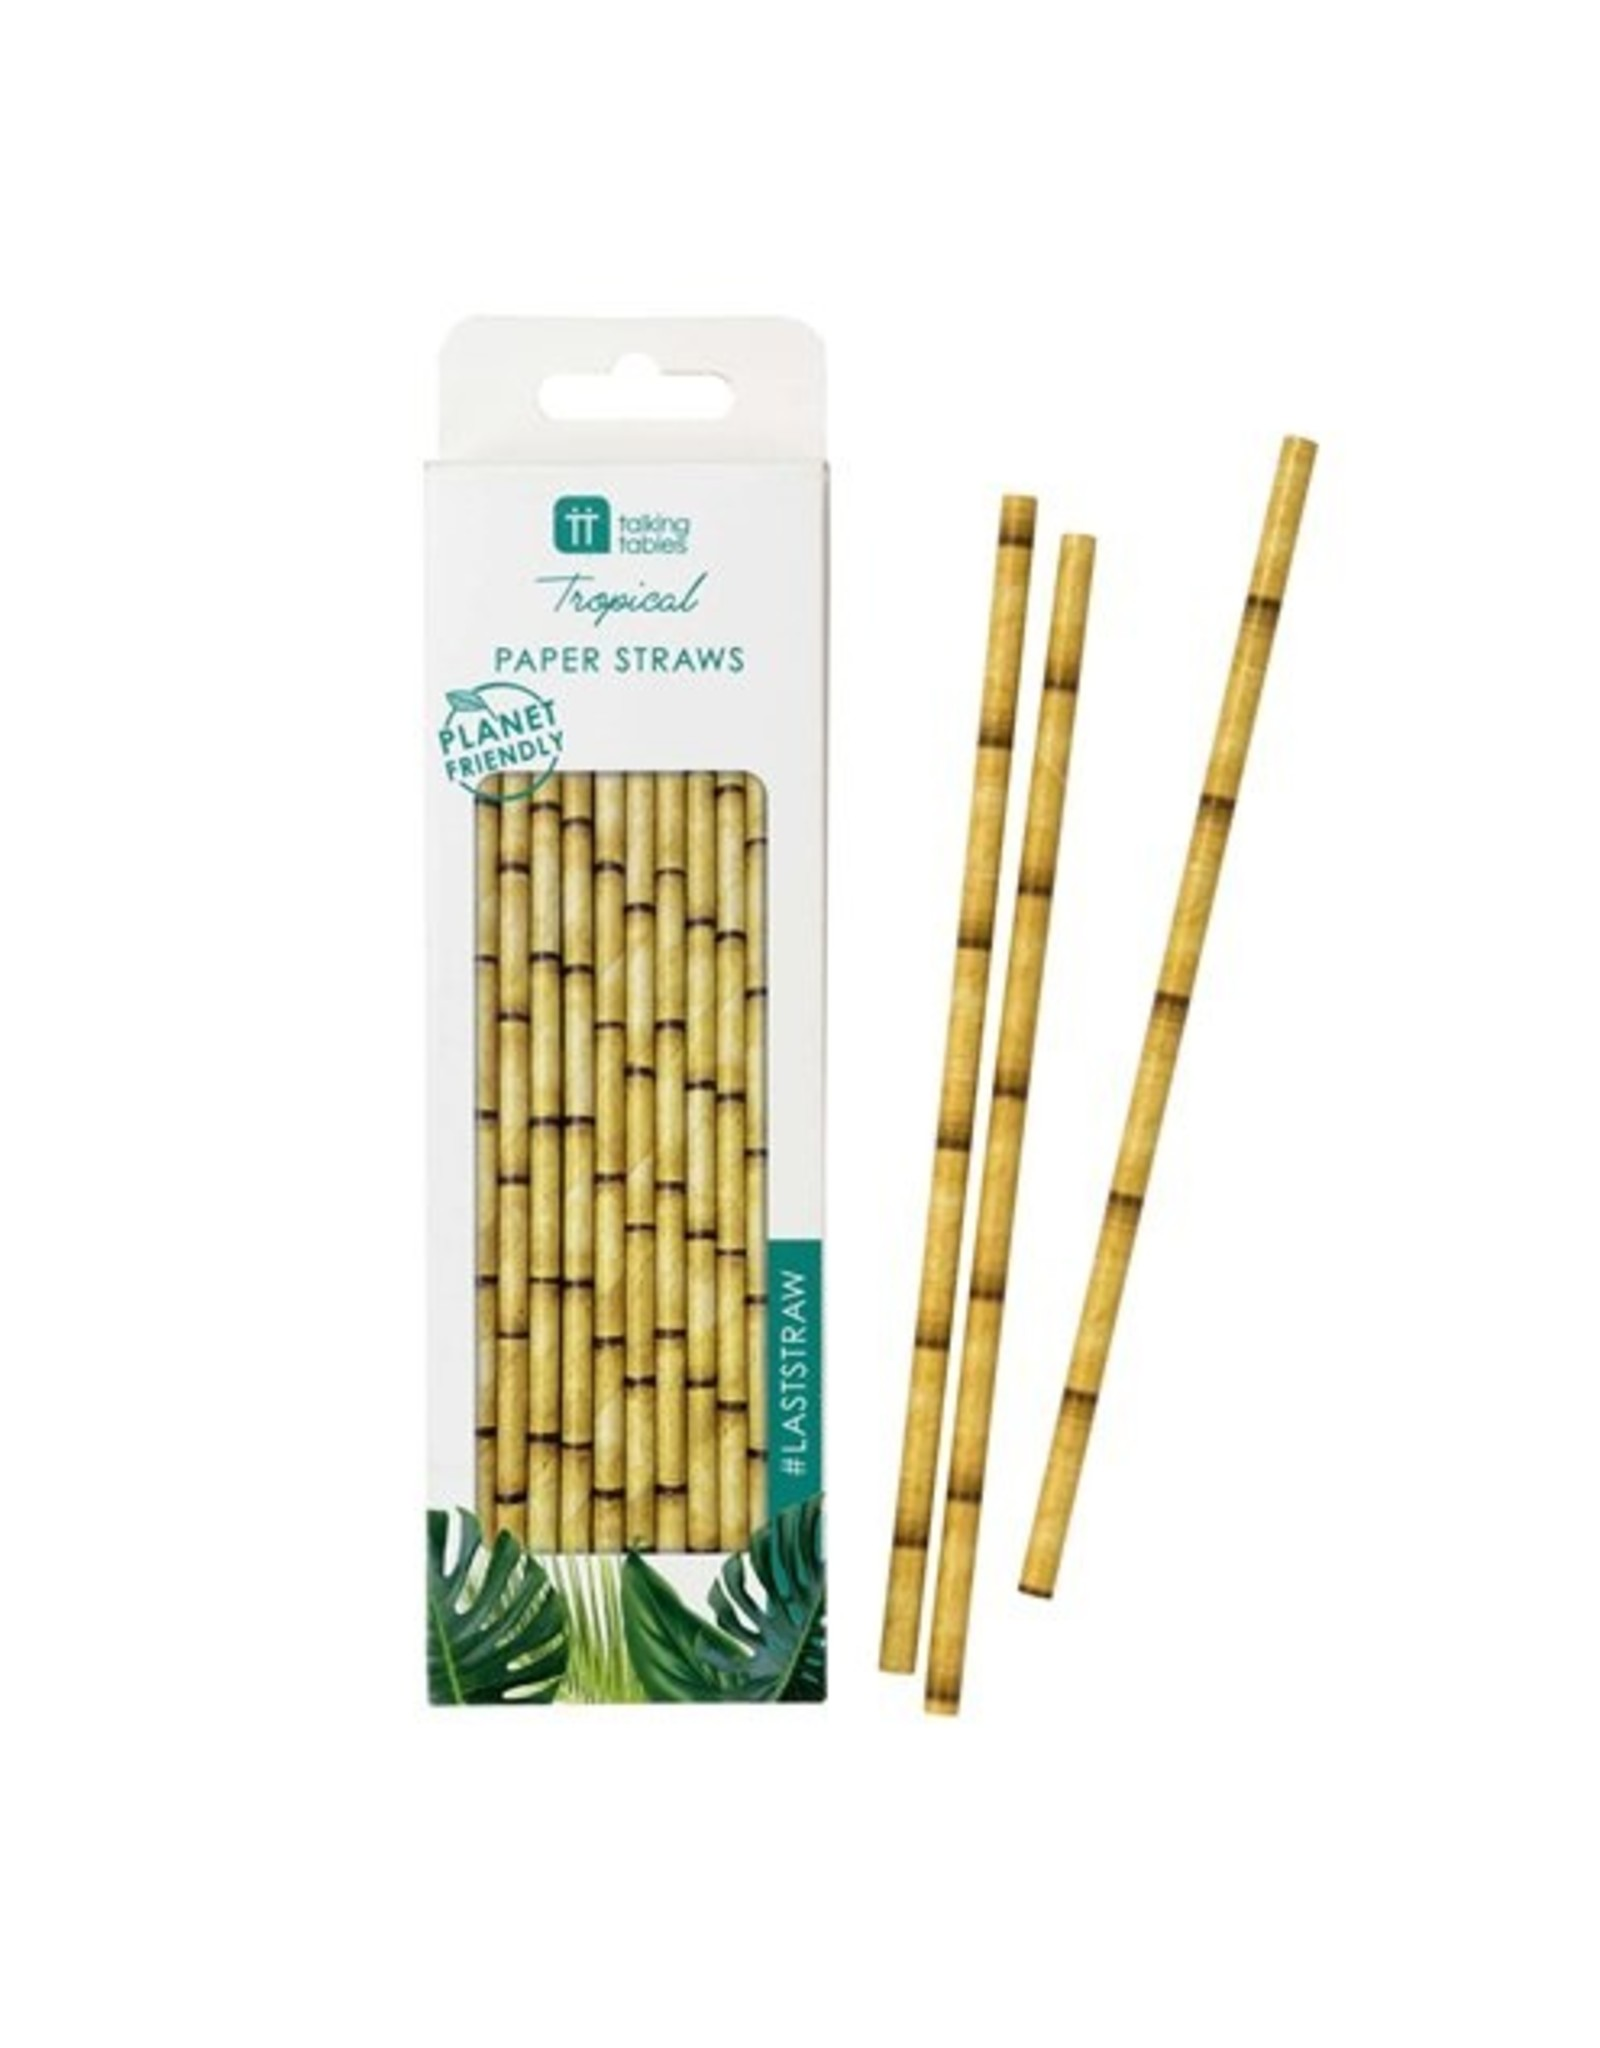 30 bamboe rietjes